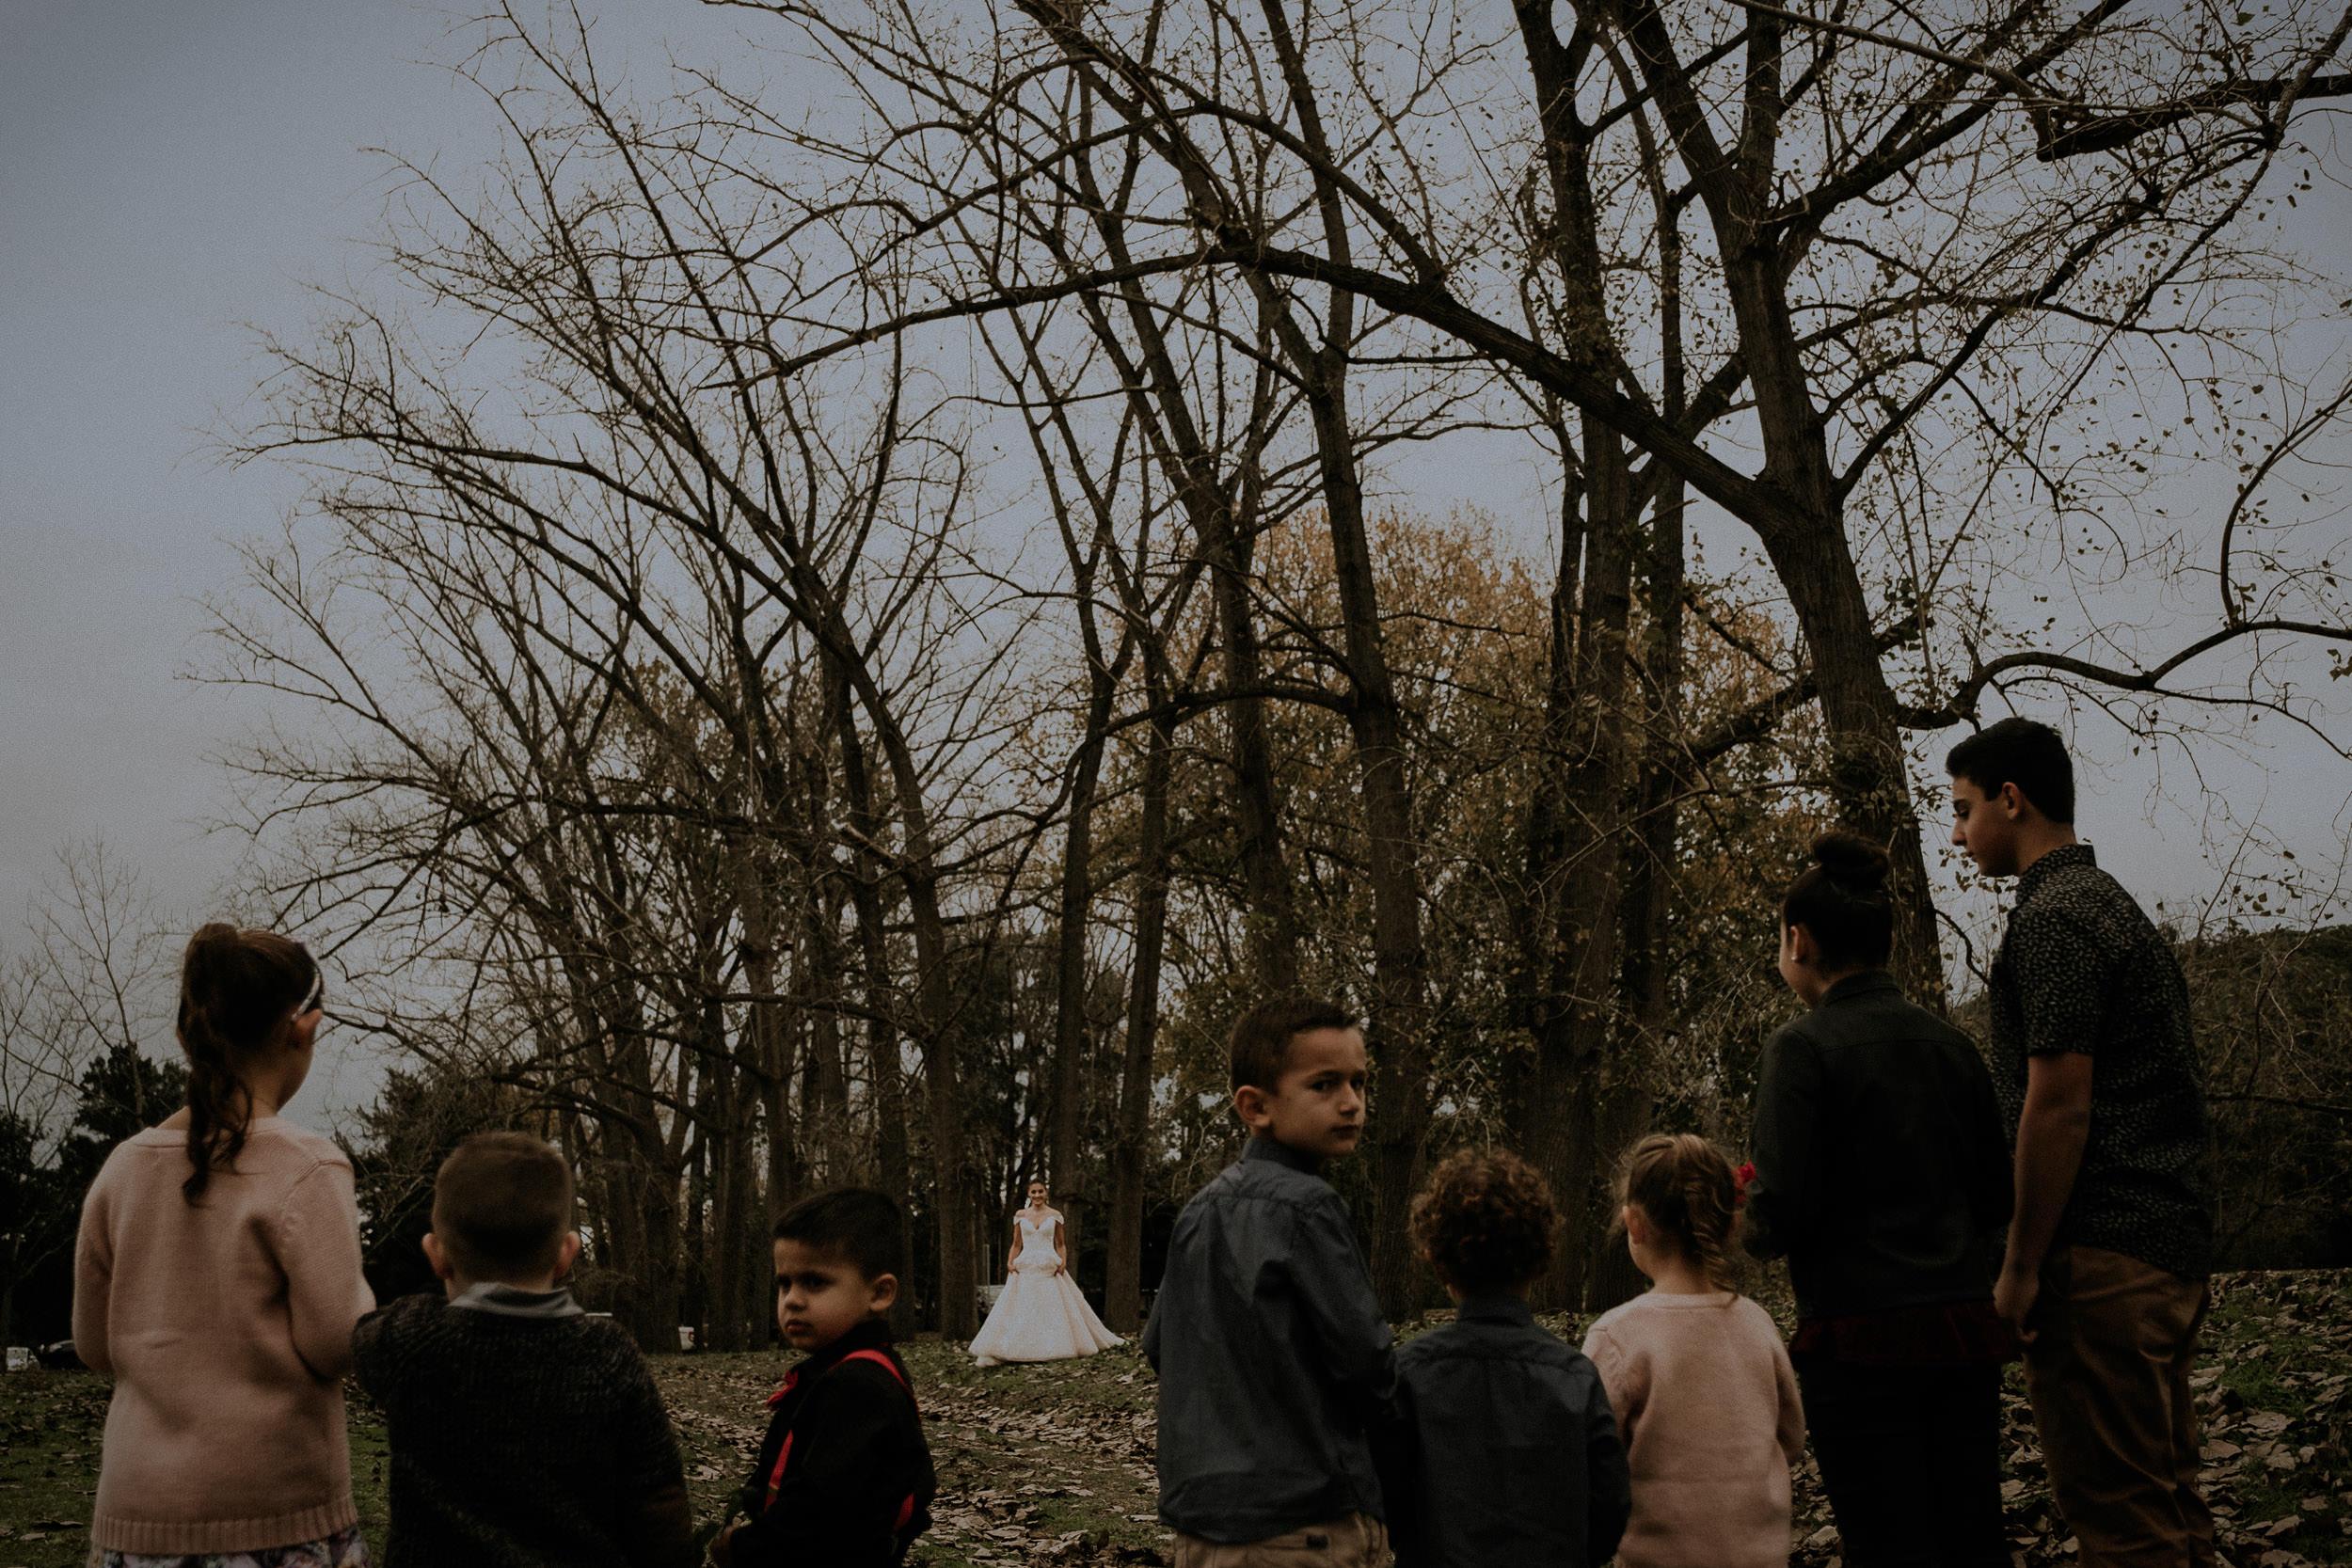 g_c wedding - kings _ thieves elopement wedding photography - blog 16.jpg